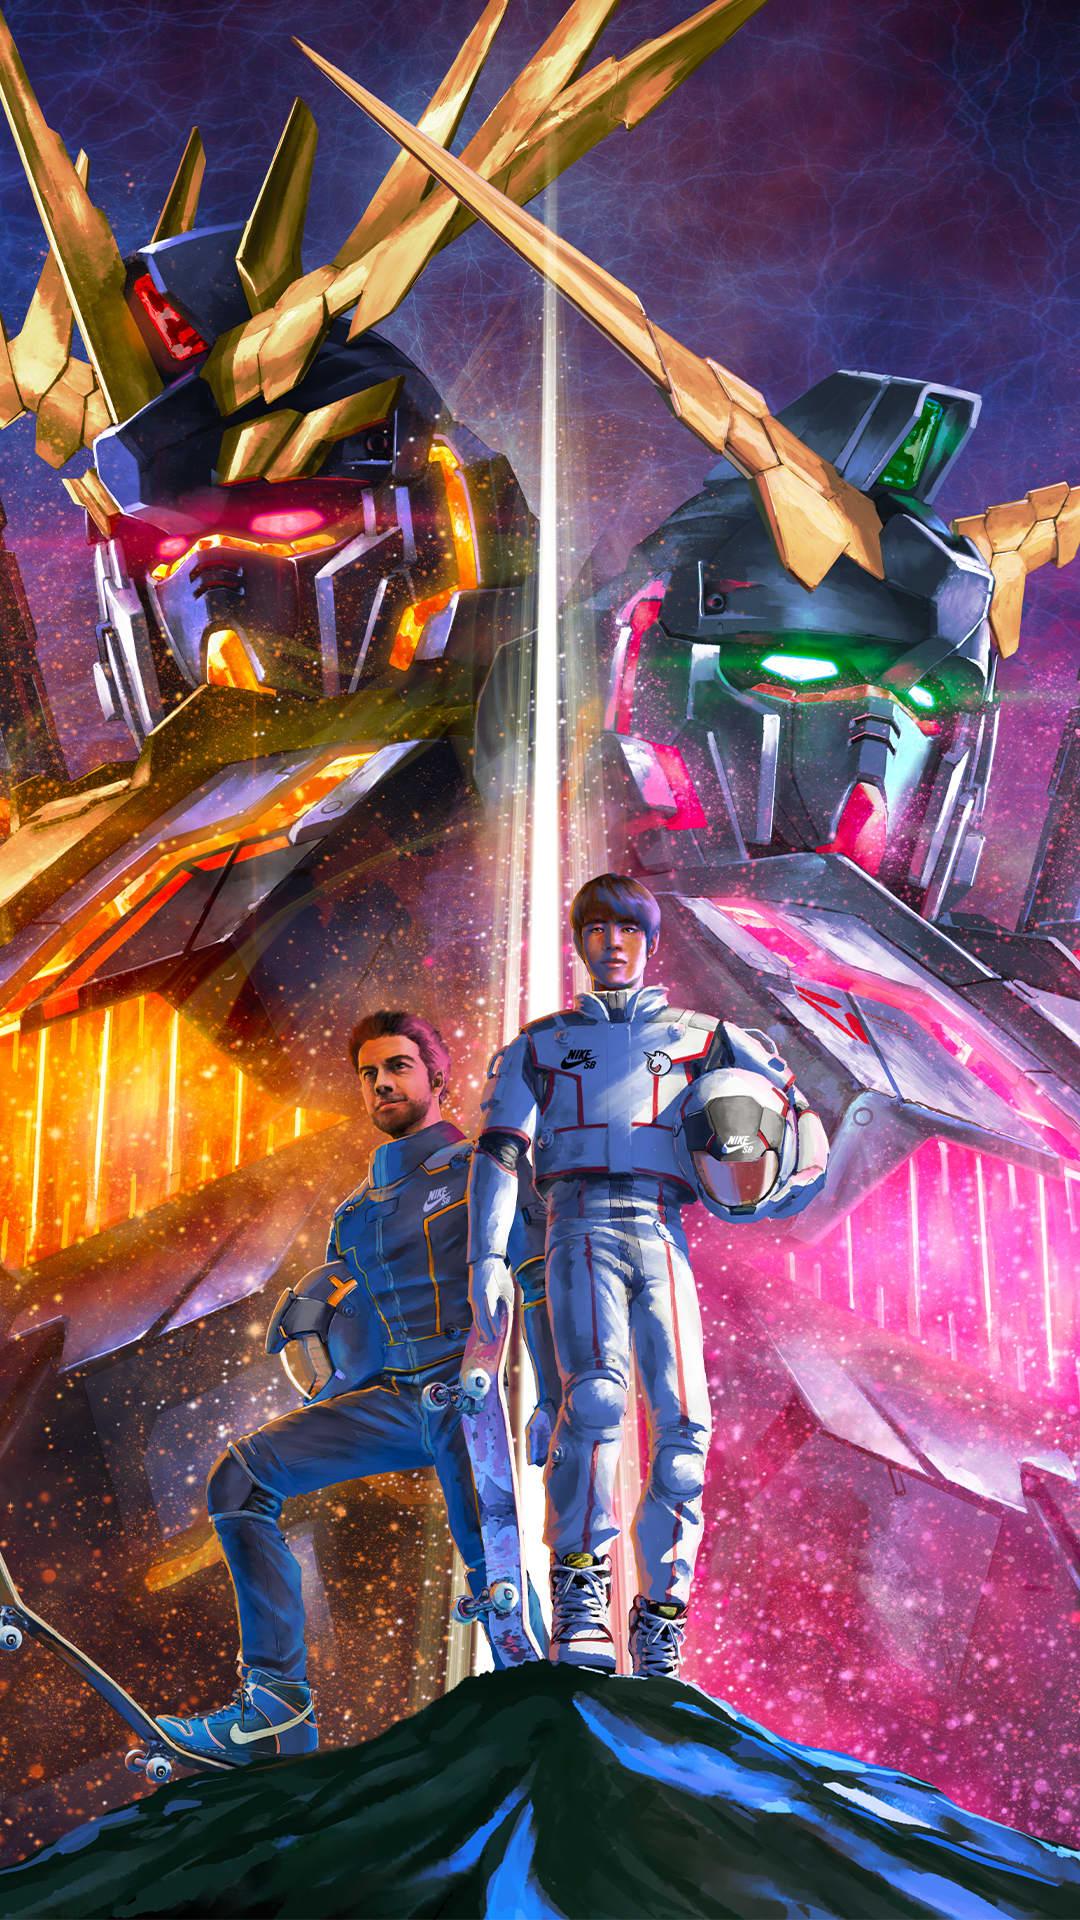 mobile-suit-gundam-unicorn-nike-sb-dunk-high-release-20210927-snkrs